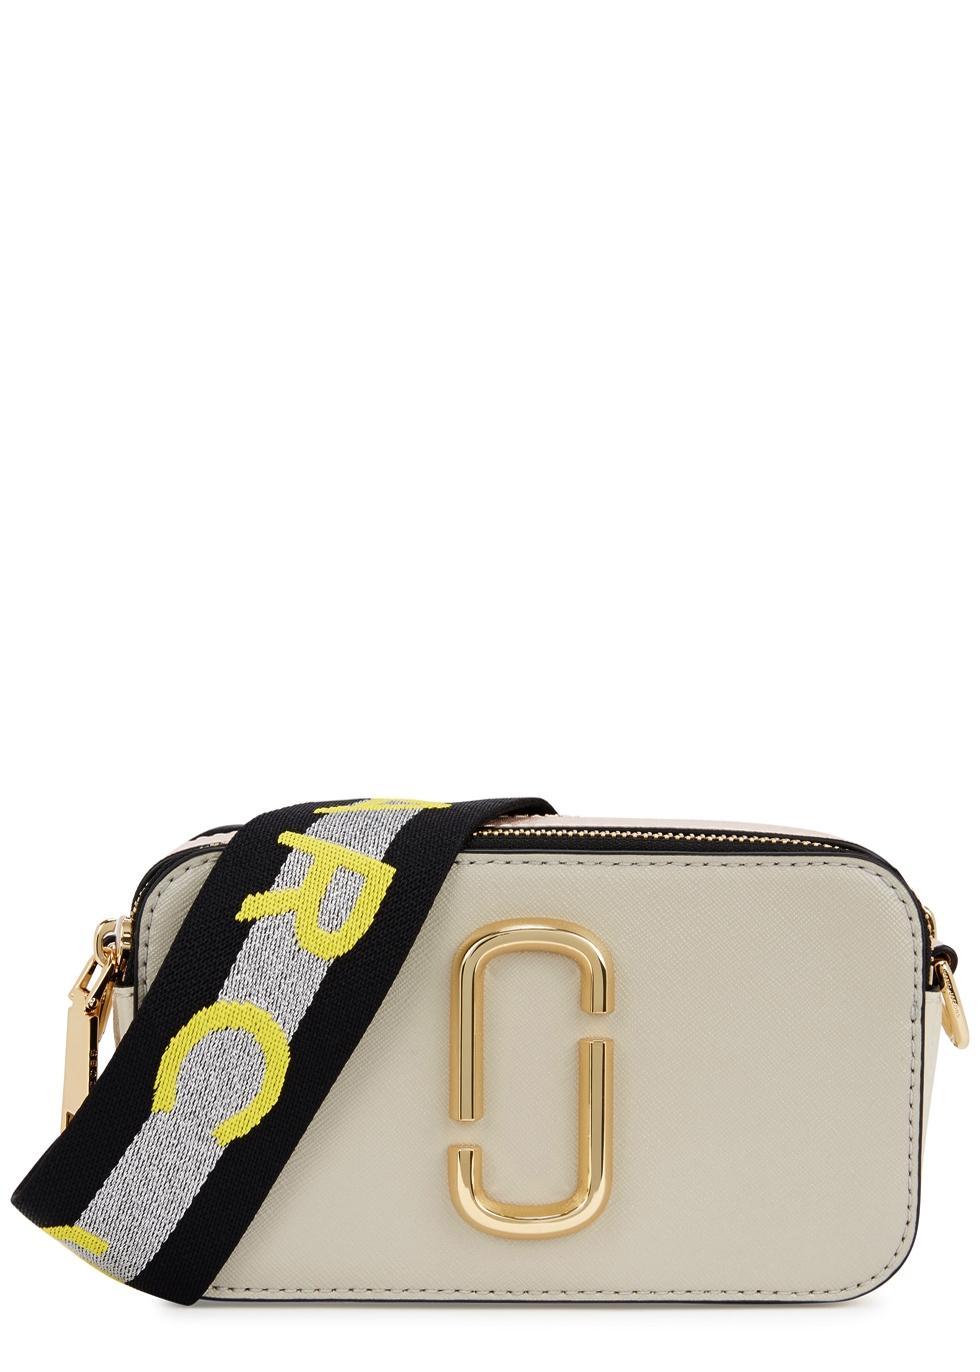 394219d02fc Marc Jacobs Bags, Watches, Dresses, Perfume - Harvey Nichols